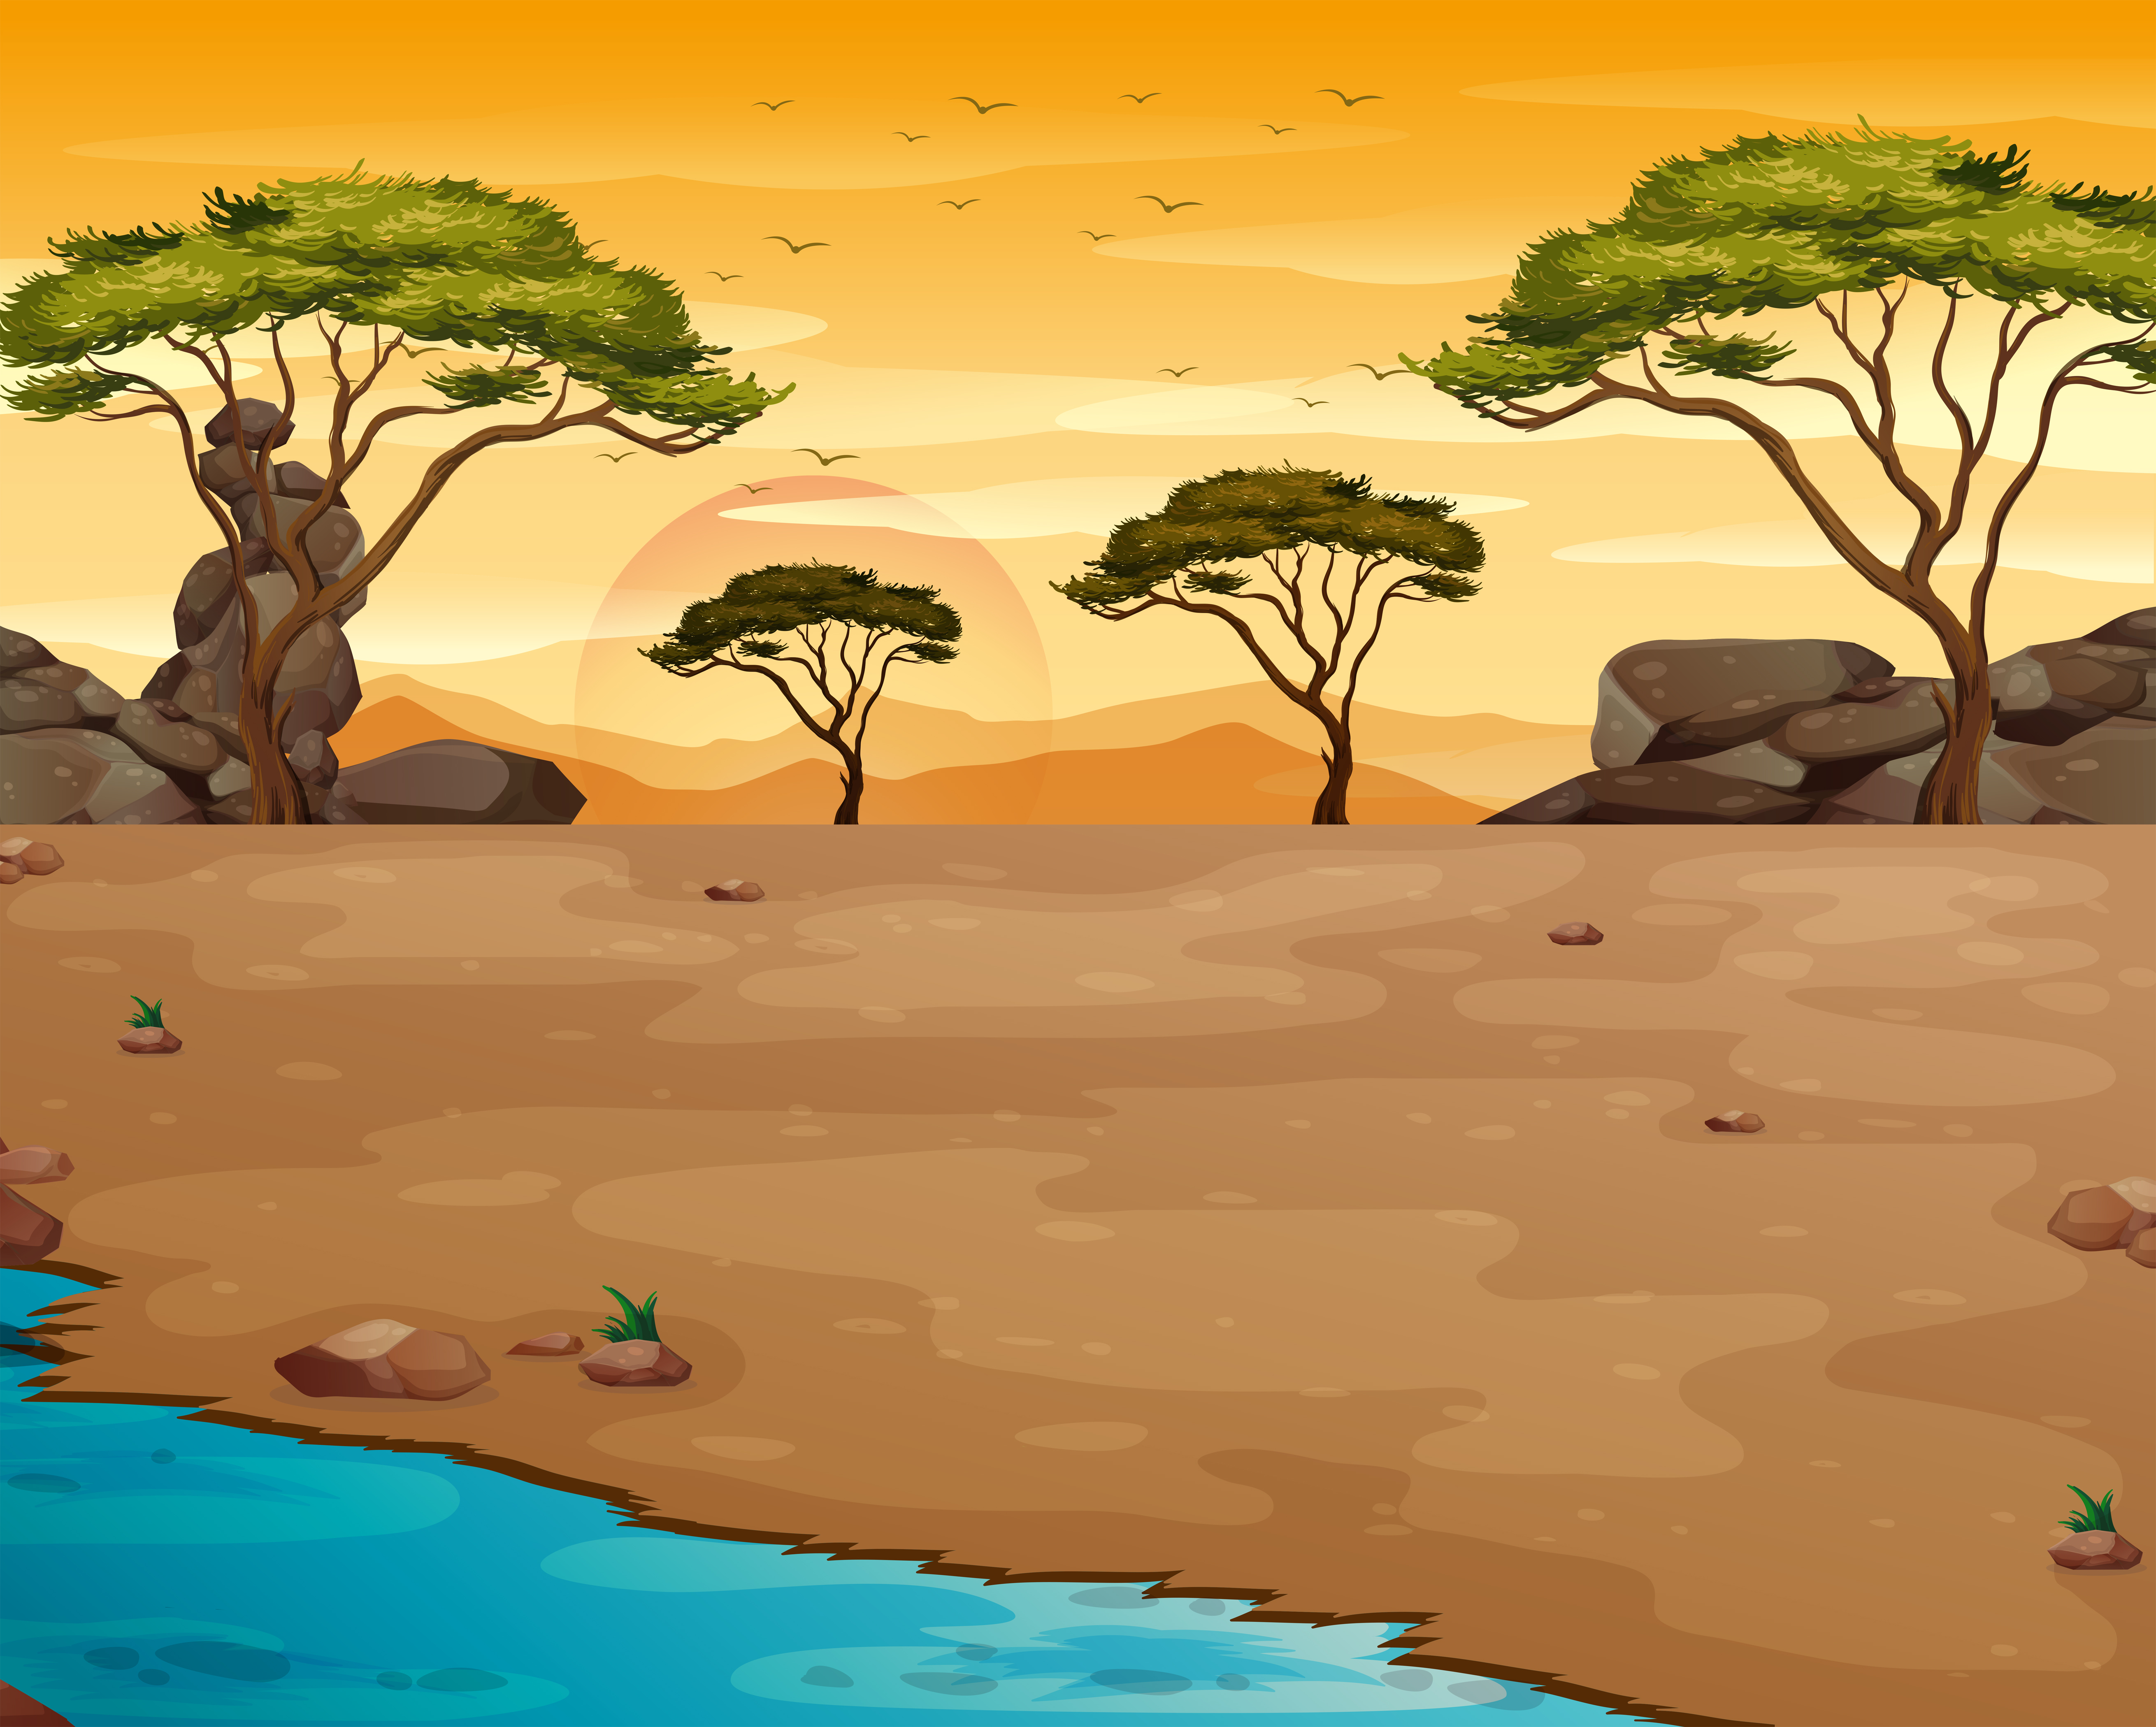 Fototapete Afrika Sonnenuntergang Gitaffe Orange Strasse Savanne Baum Sonne Himm